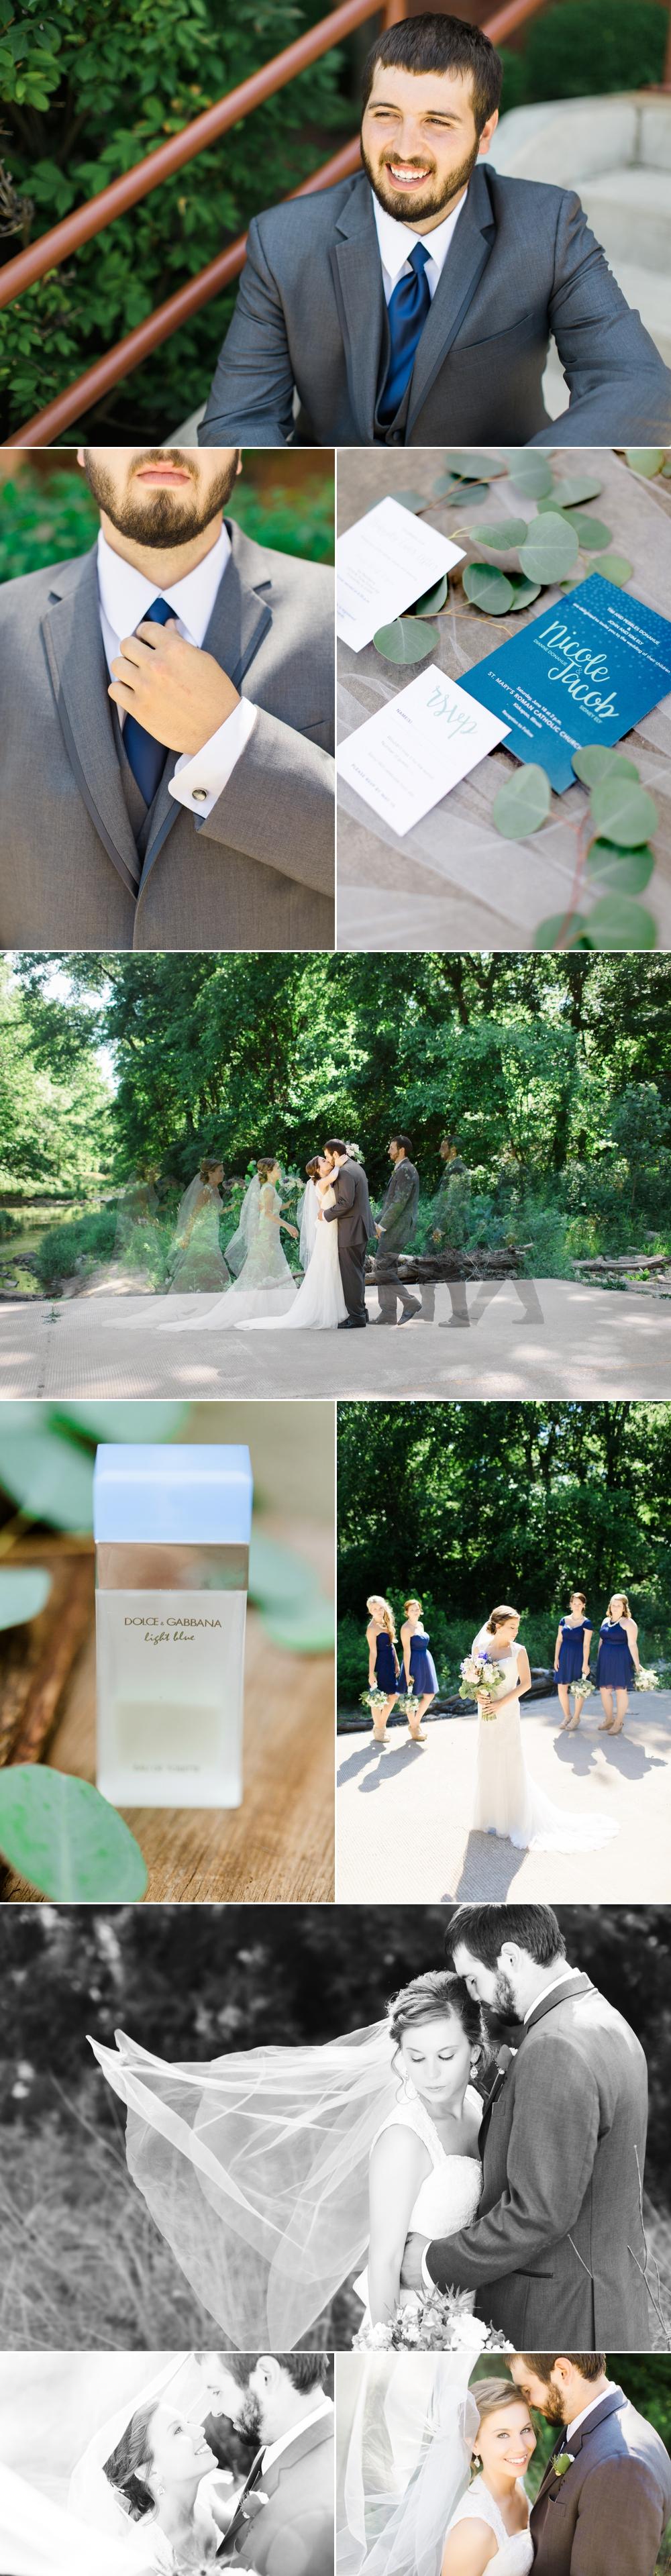 Ely Blog Collage 2.jpg